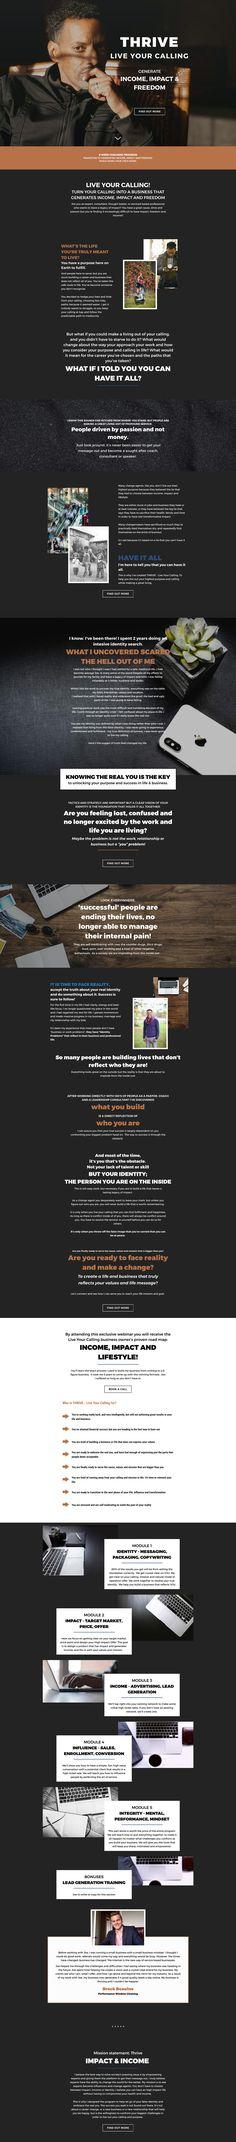 Private Coaching Client of Segerius Bruce Coaching. Sales page in Wordpress. Lisa Johnson, Entrepreneur Magazine, Brand Strategist, Success Coach, Famous Photographers, Design Development, Photography Business, Personal Branding, Business Design